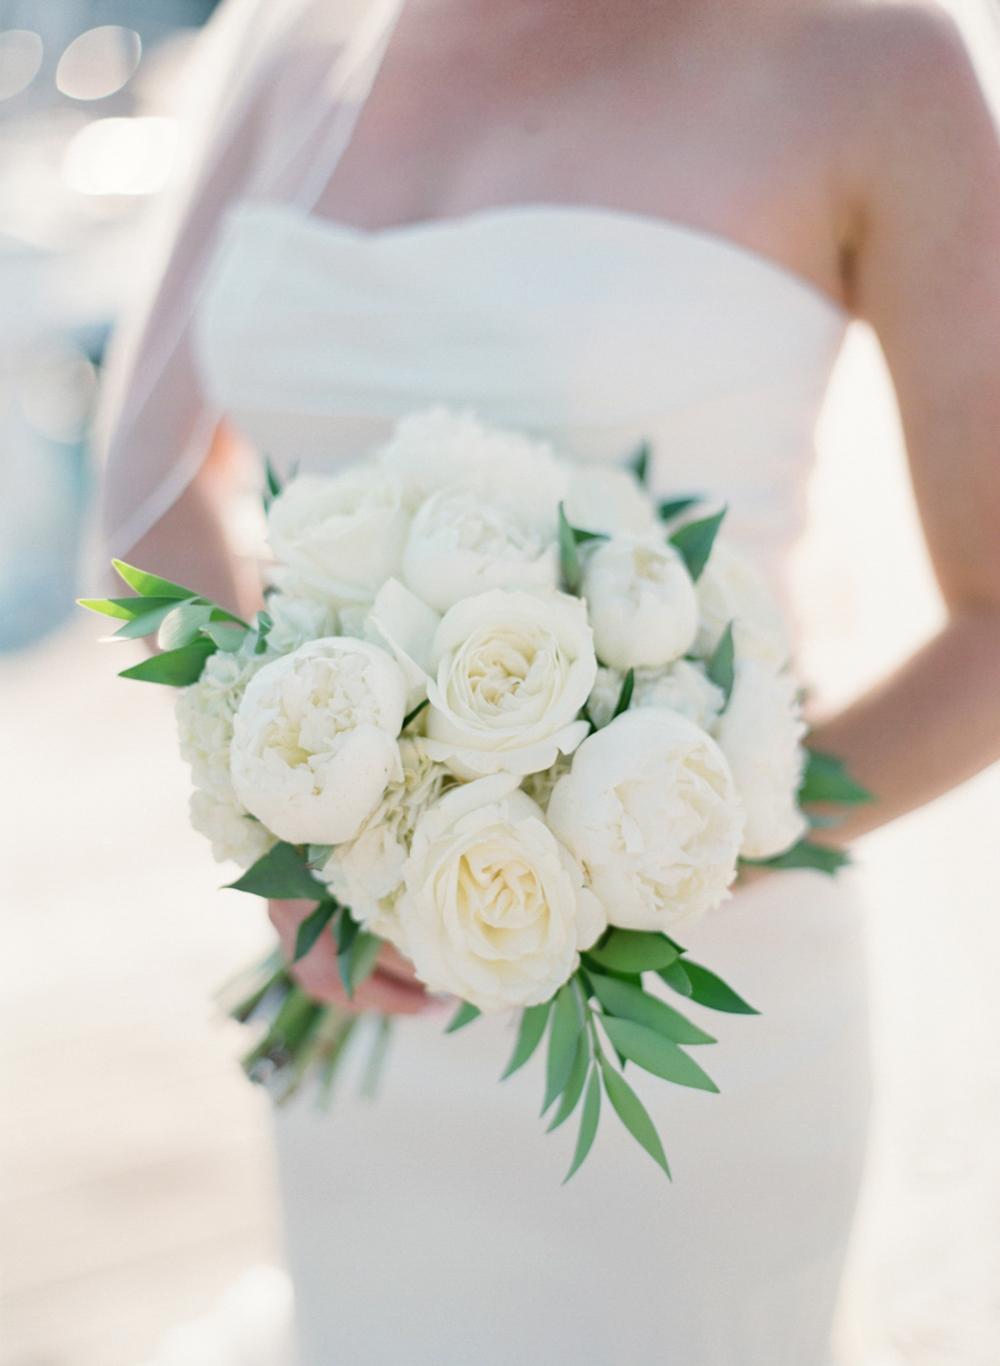 About_Thyme_Farm_Door_County_Wedding_032.jpg